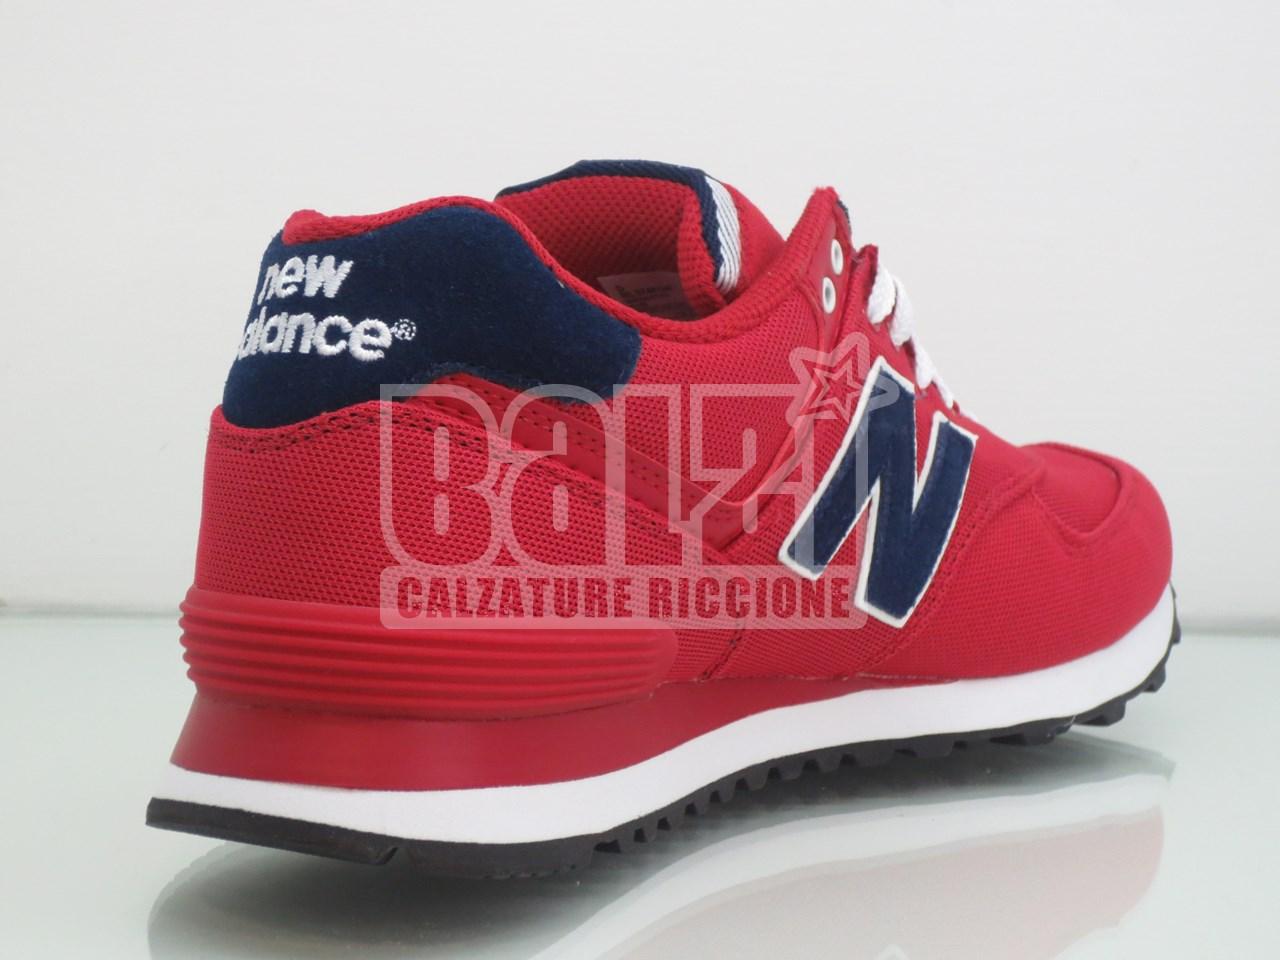 new balance 574 uomo red